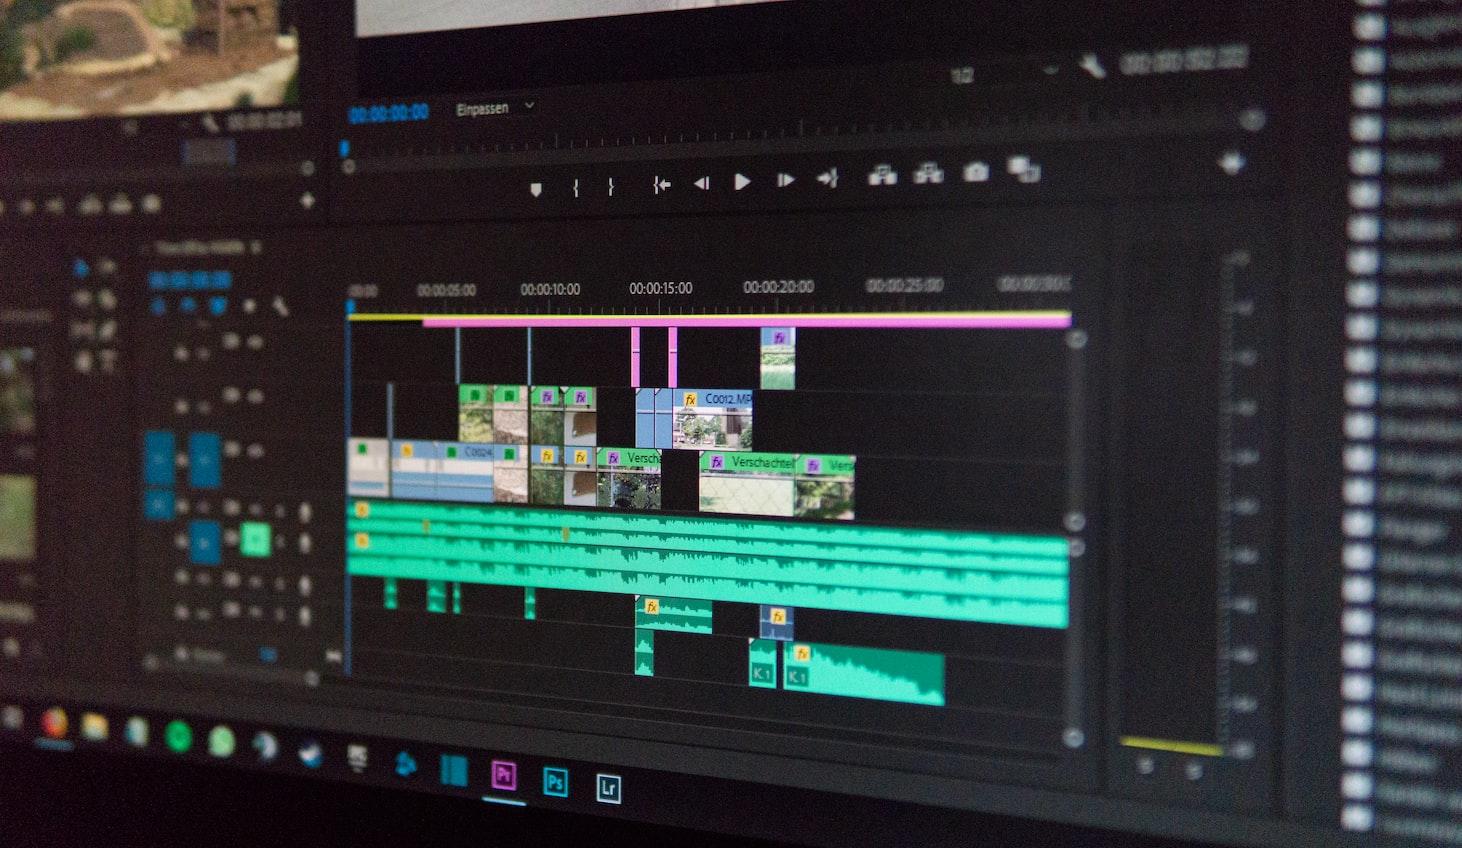 Editing Video #6: Proses Tahapan Dalam Editing Video